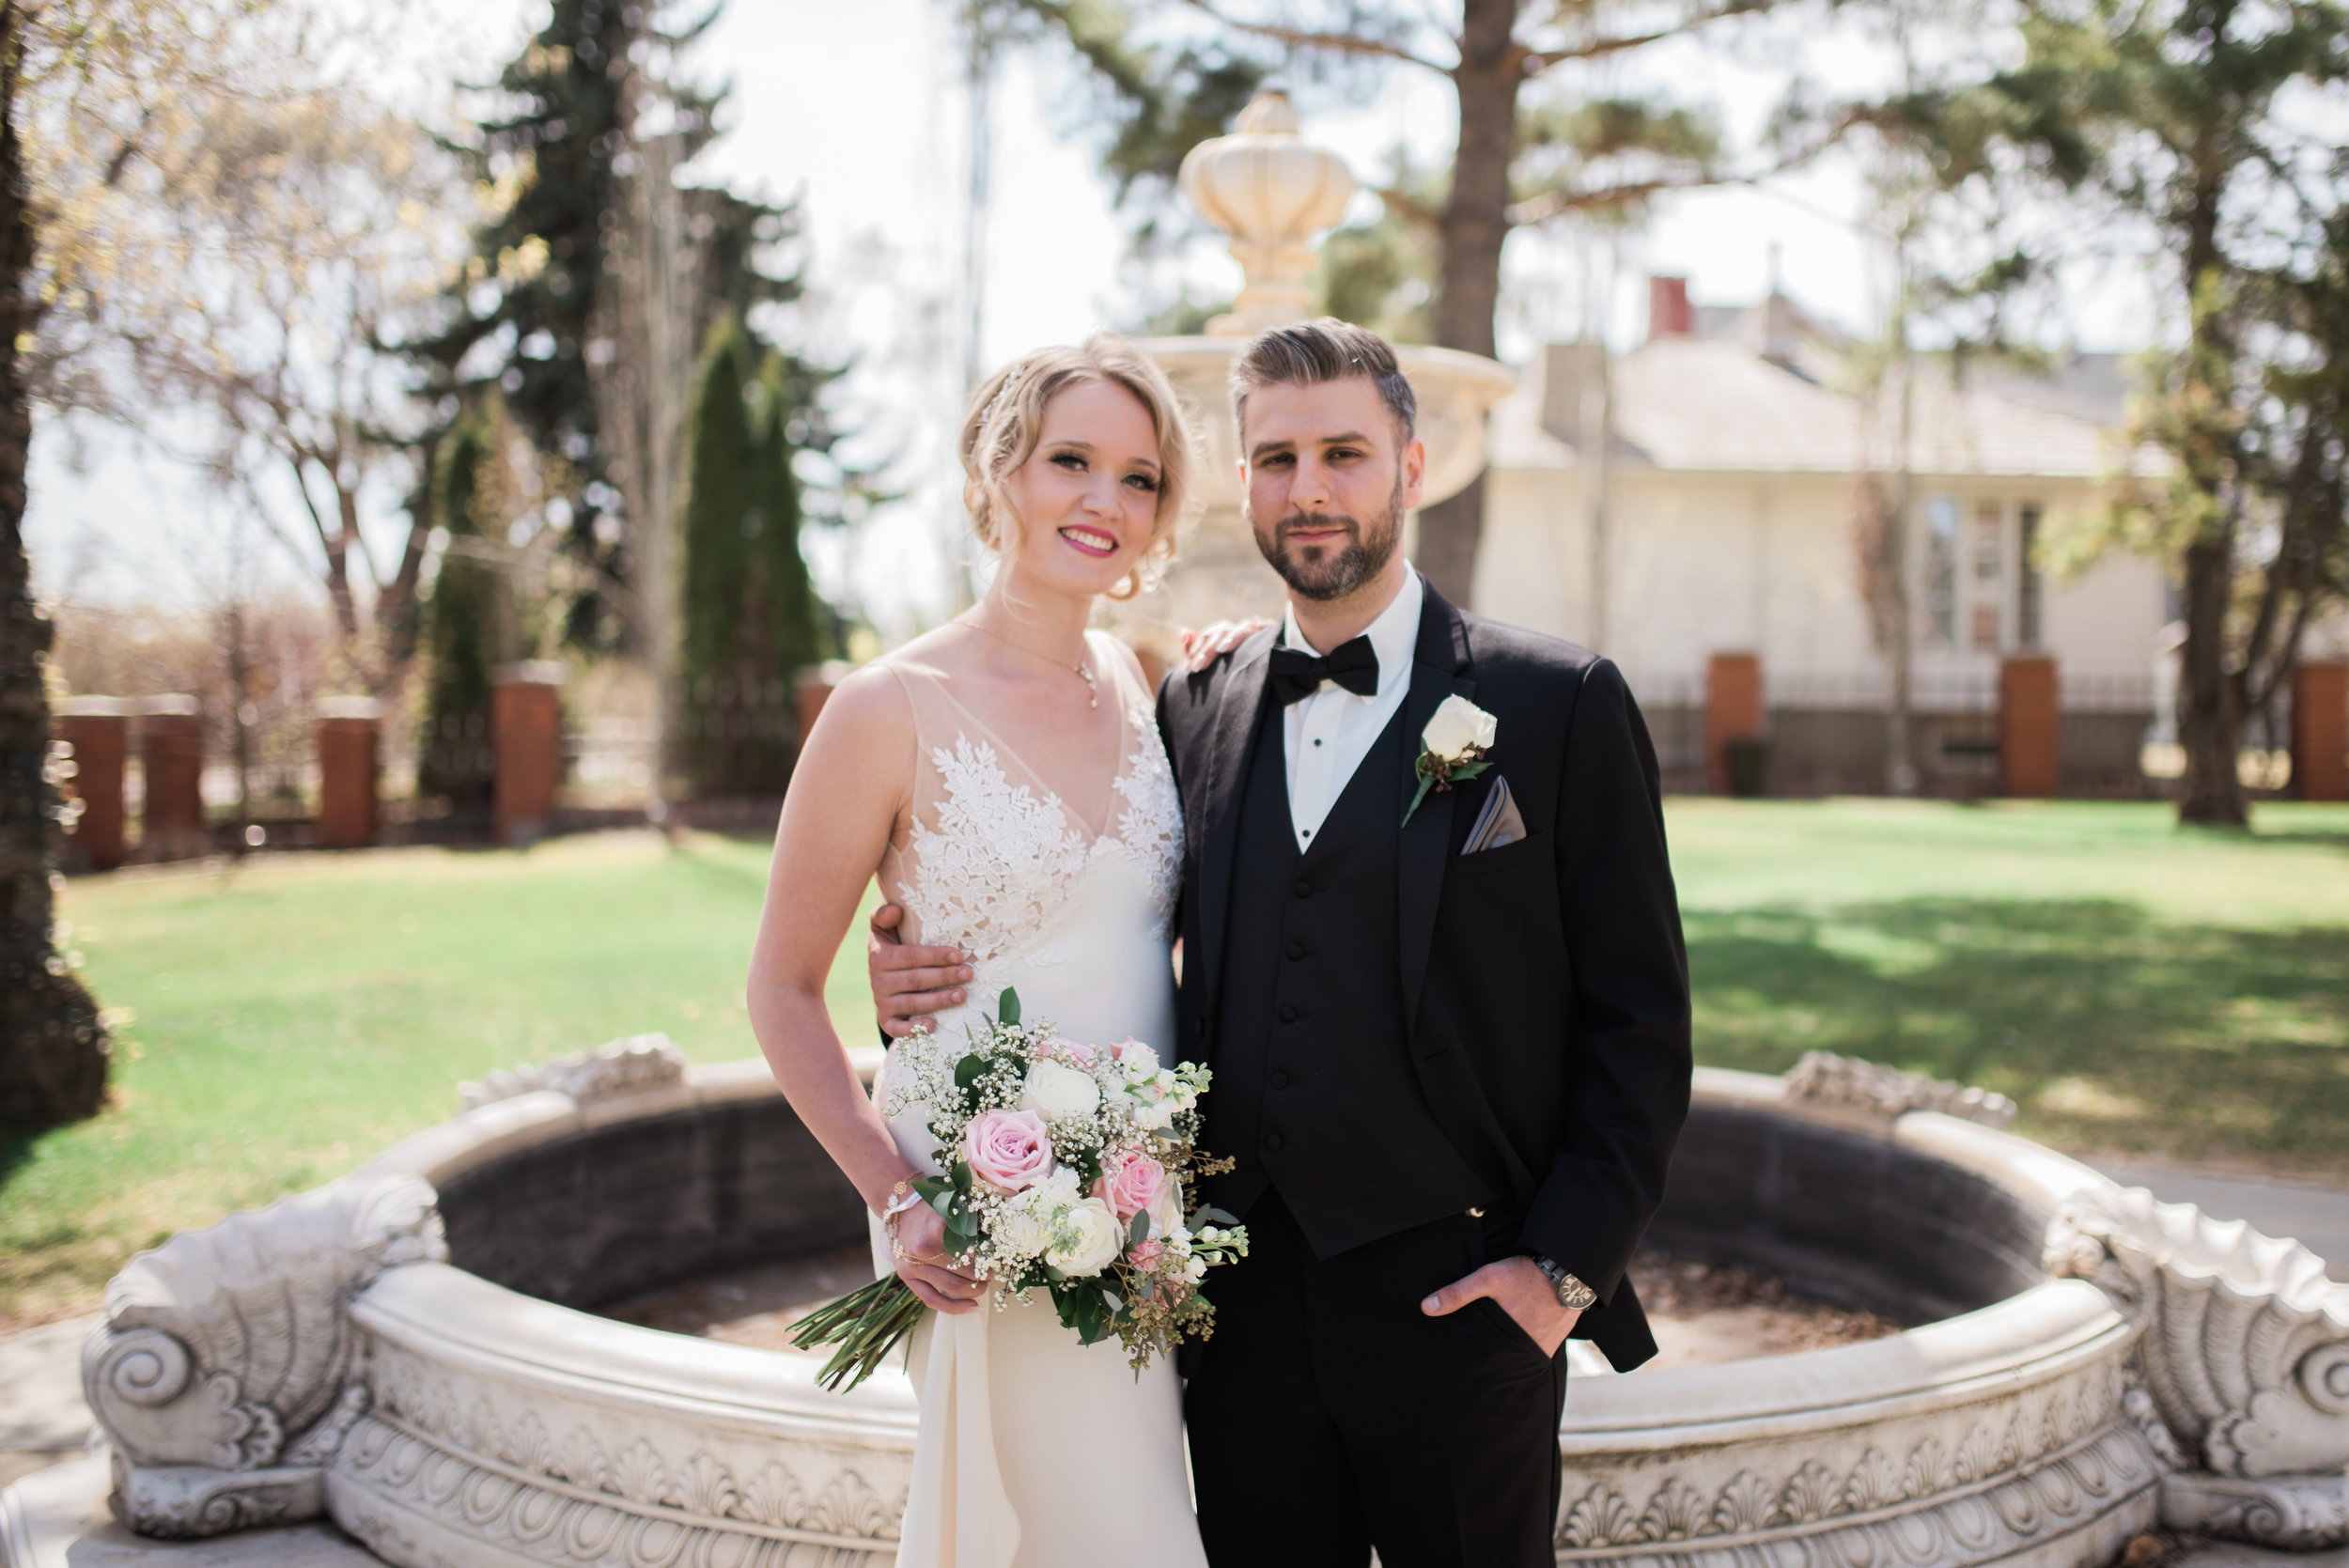 Ali Samantha Wedding 955.jpg